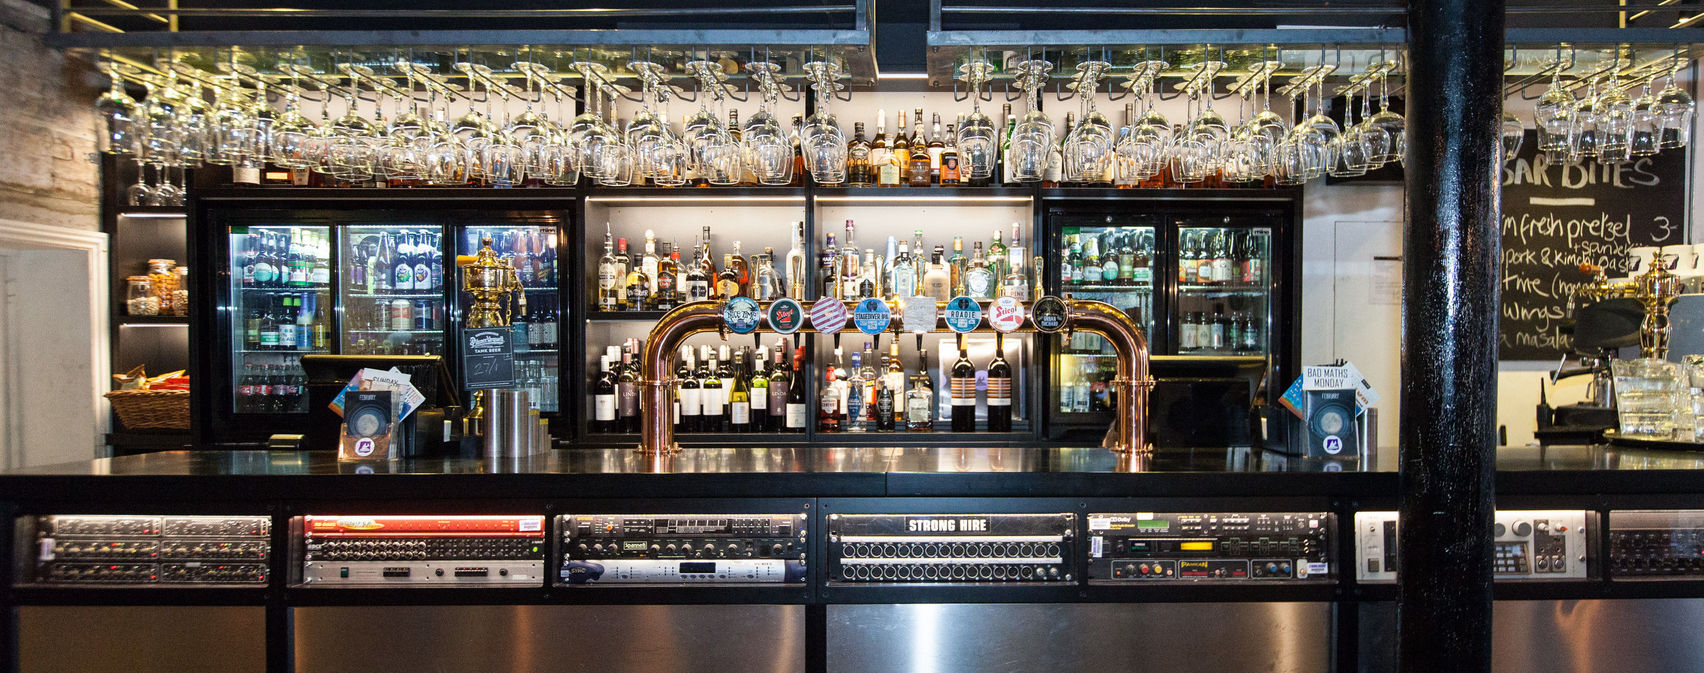 Rivington St Bar, Strongroom Bar & Kitchen